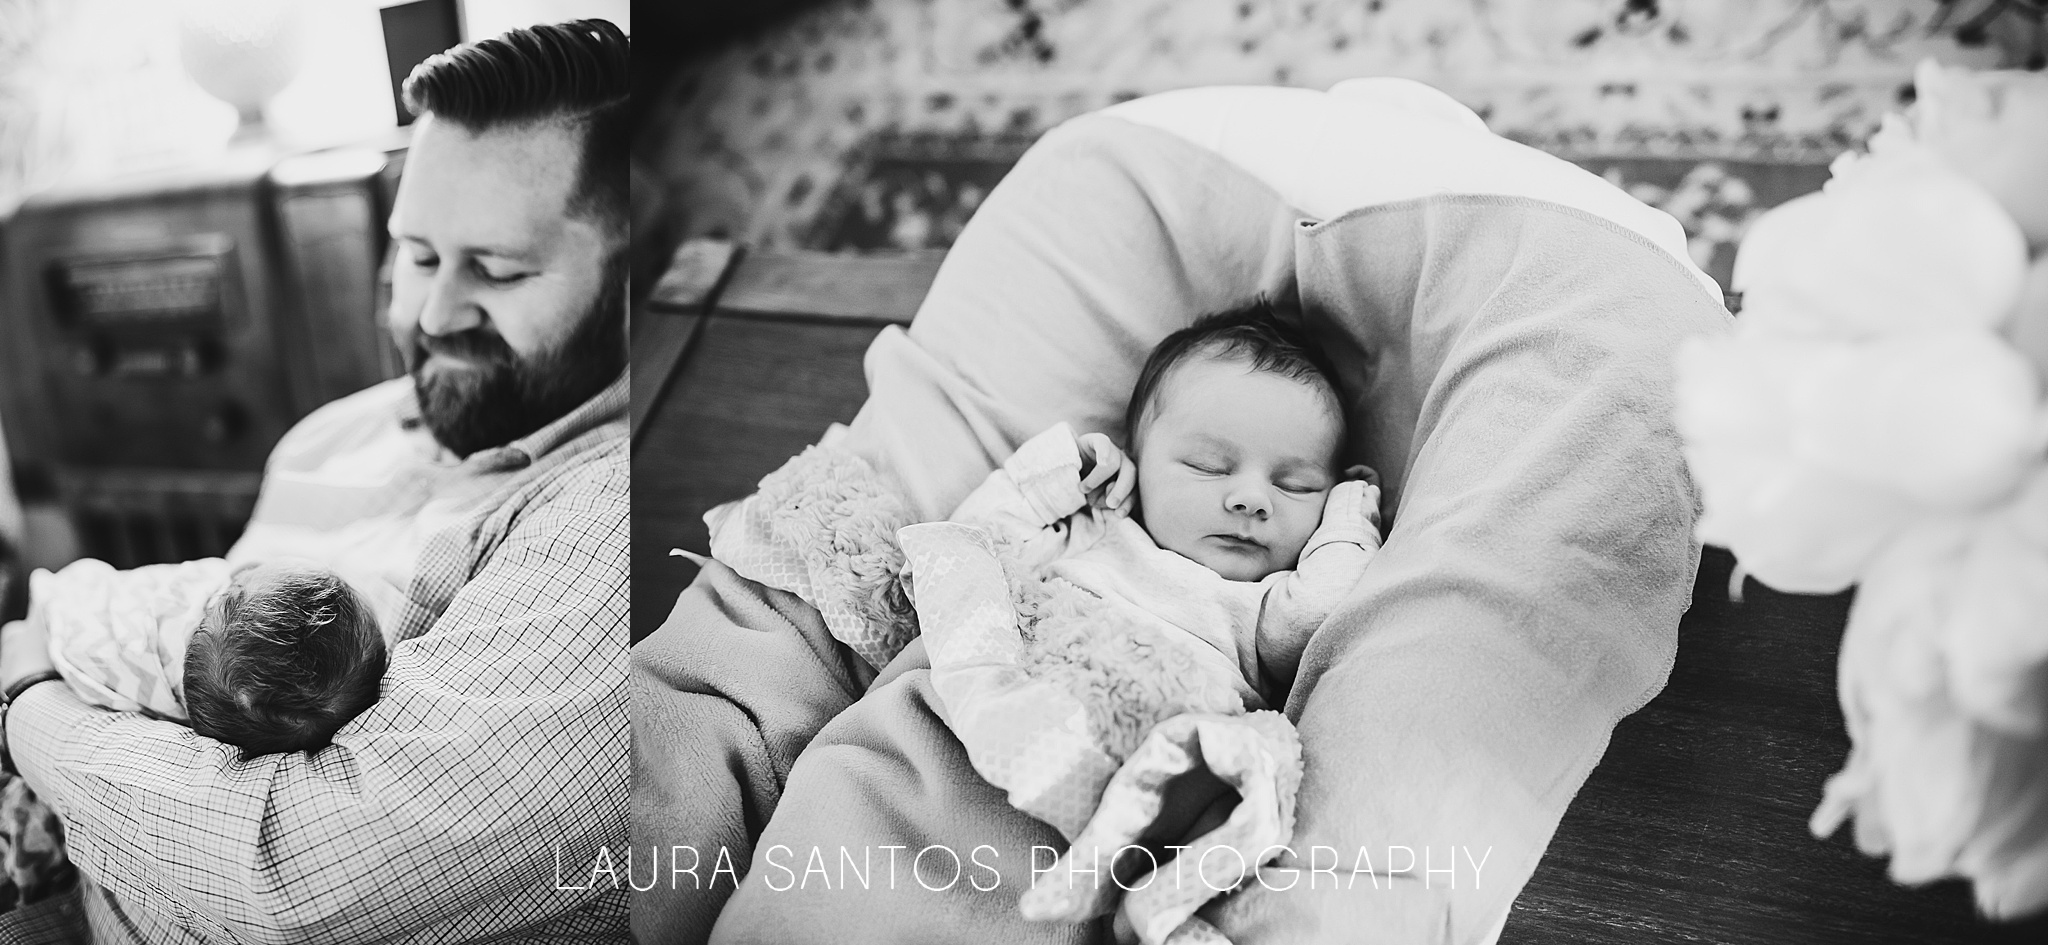 Laura Santos Photography Portland Oregon Family Photographer_0990.jpg